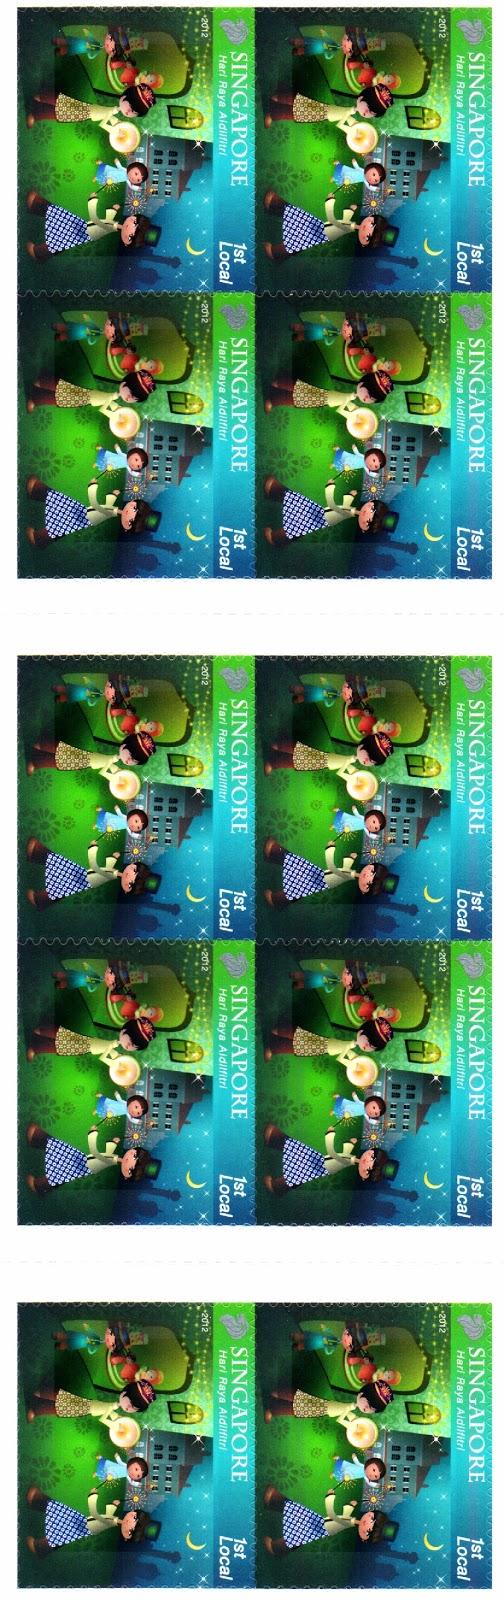 Self-adhesive Stamp Booklet S$2.55 - Hari Raya Puasa / Aidilfitri